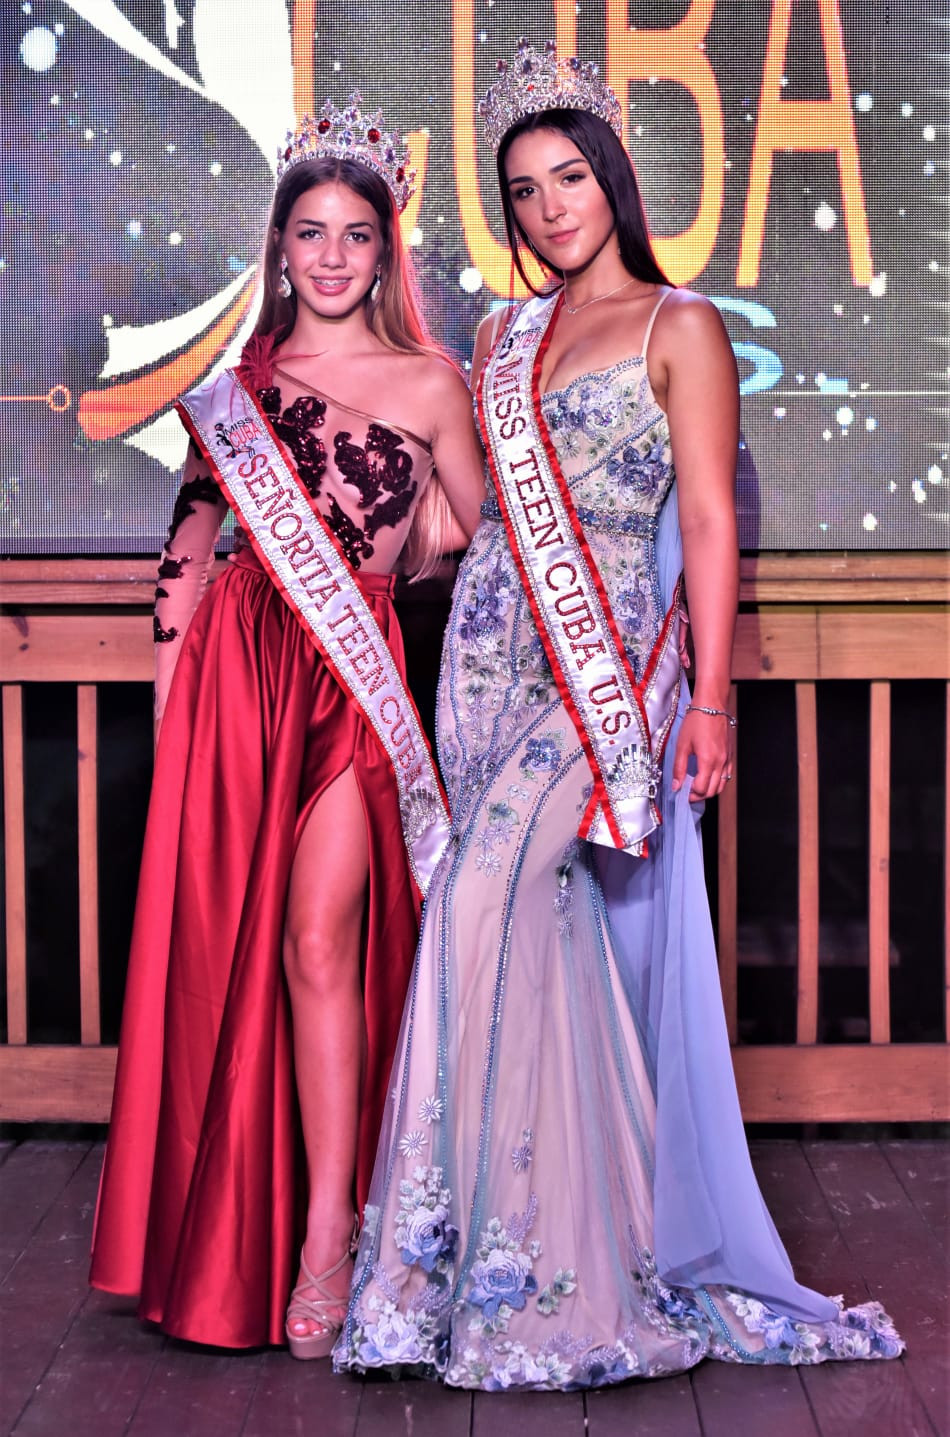 Dos reinas juveniles Cubanas Señorita Teen Cuba 2020, Angelina Asbert y Miss Teen Cuba U.S. 2020, Elisa Gregorio Vera organizado por BNC Belleza Nacional Cuba